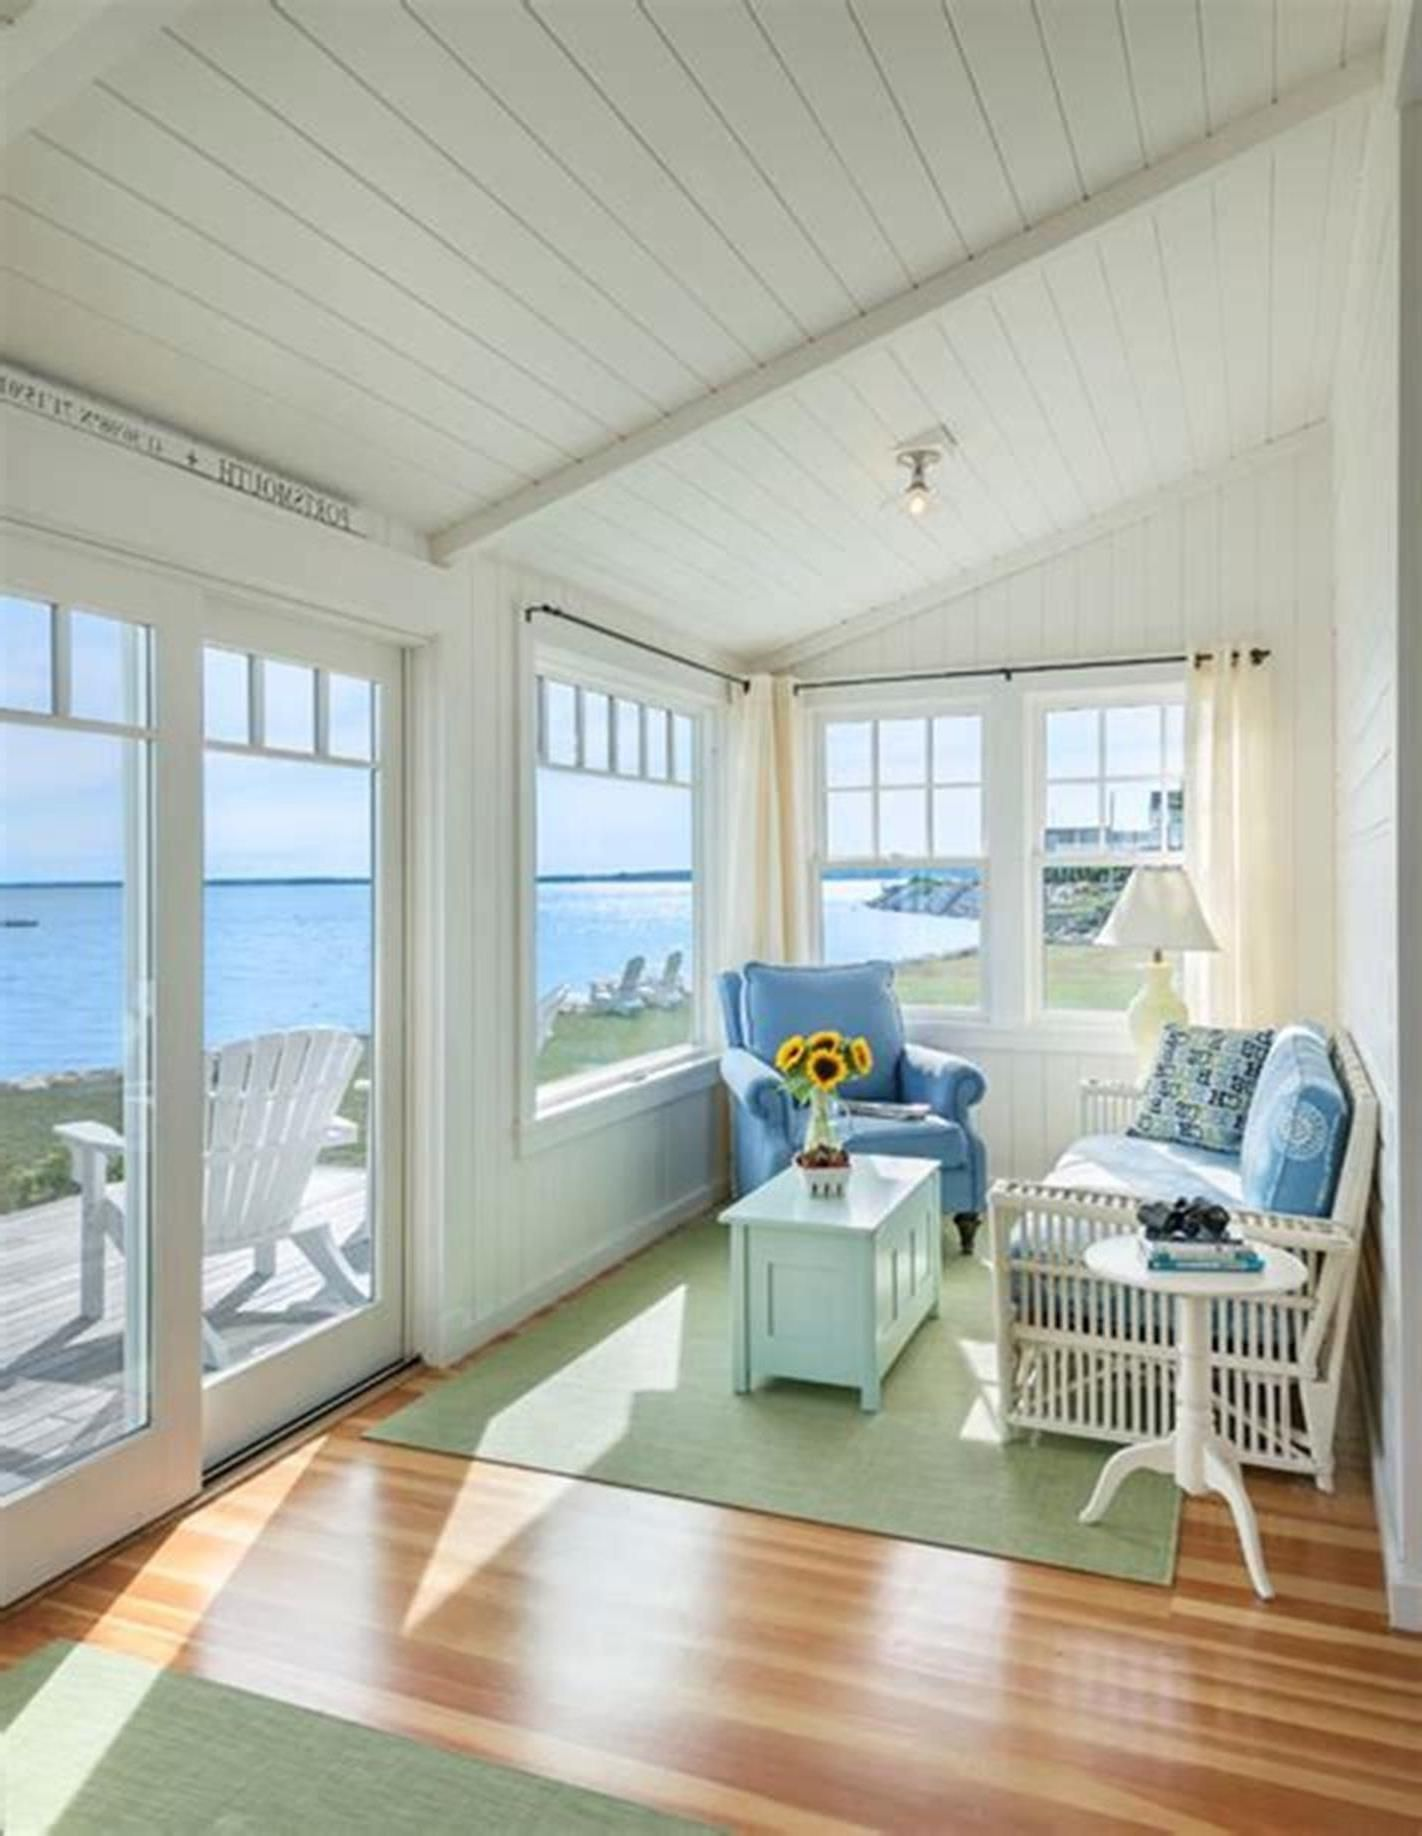 28 Stunning Sunroom Decor and Design Ideas - Craft Home Ideas